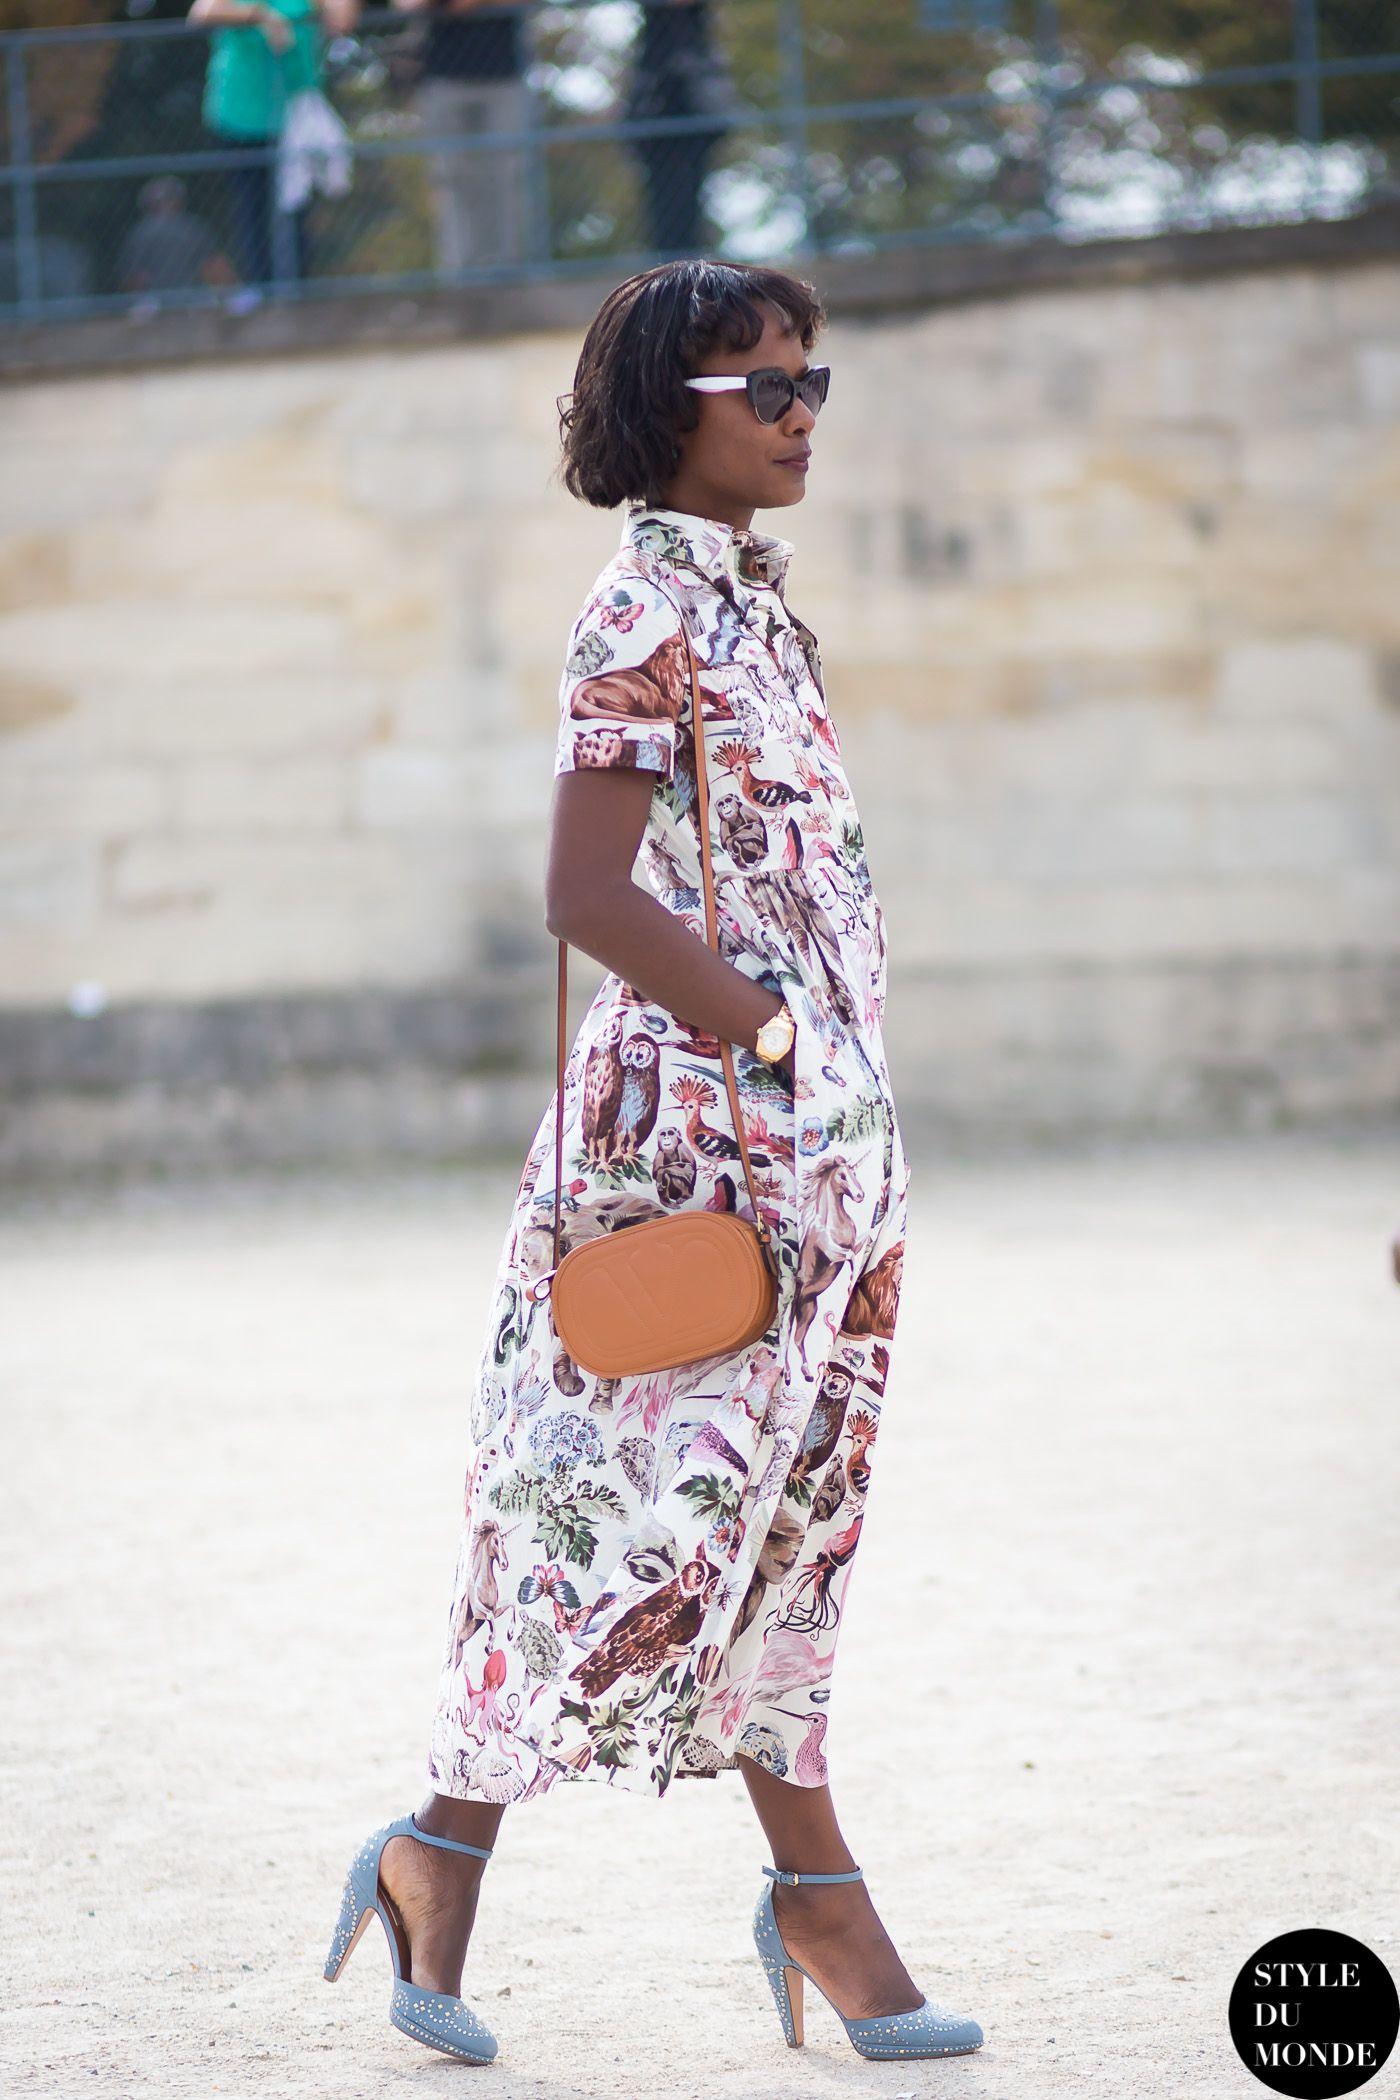 Paris FW SS15 Street Style: Shala Monroque - STYLE DU